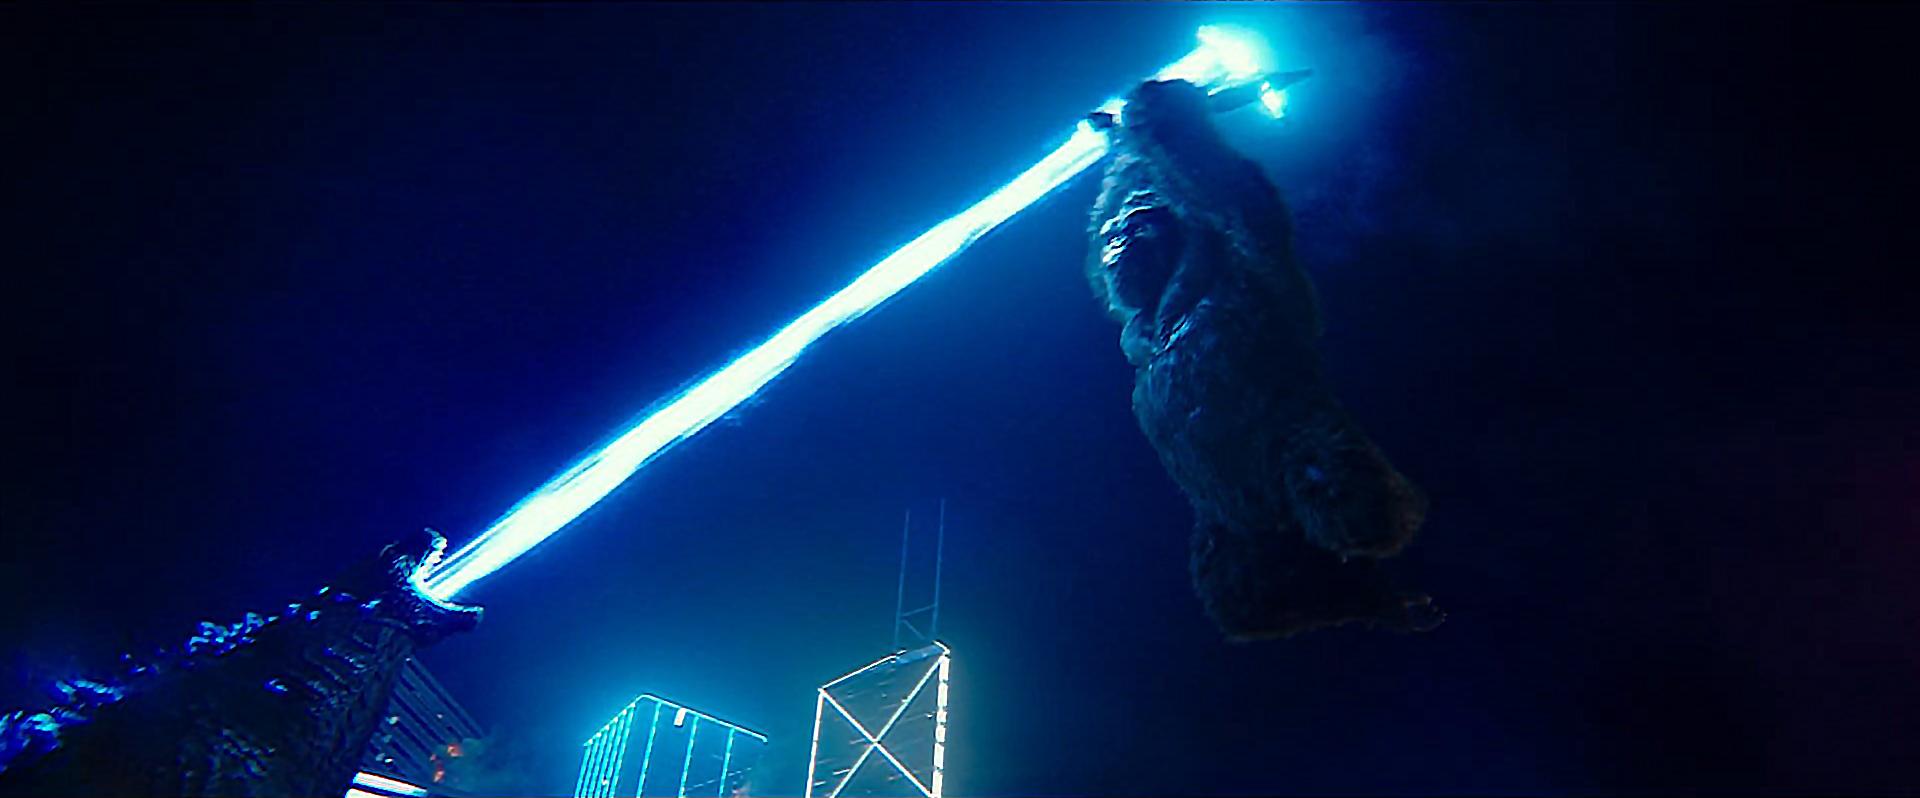 Godzilla vs Kong Trailer Still 79 - Kong blocks Godzilla's Atomic Breath